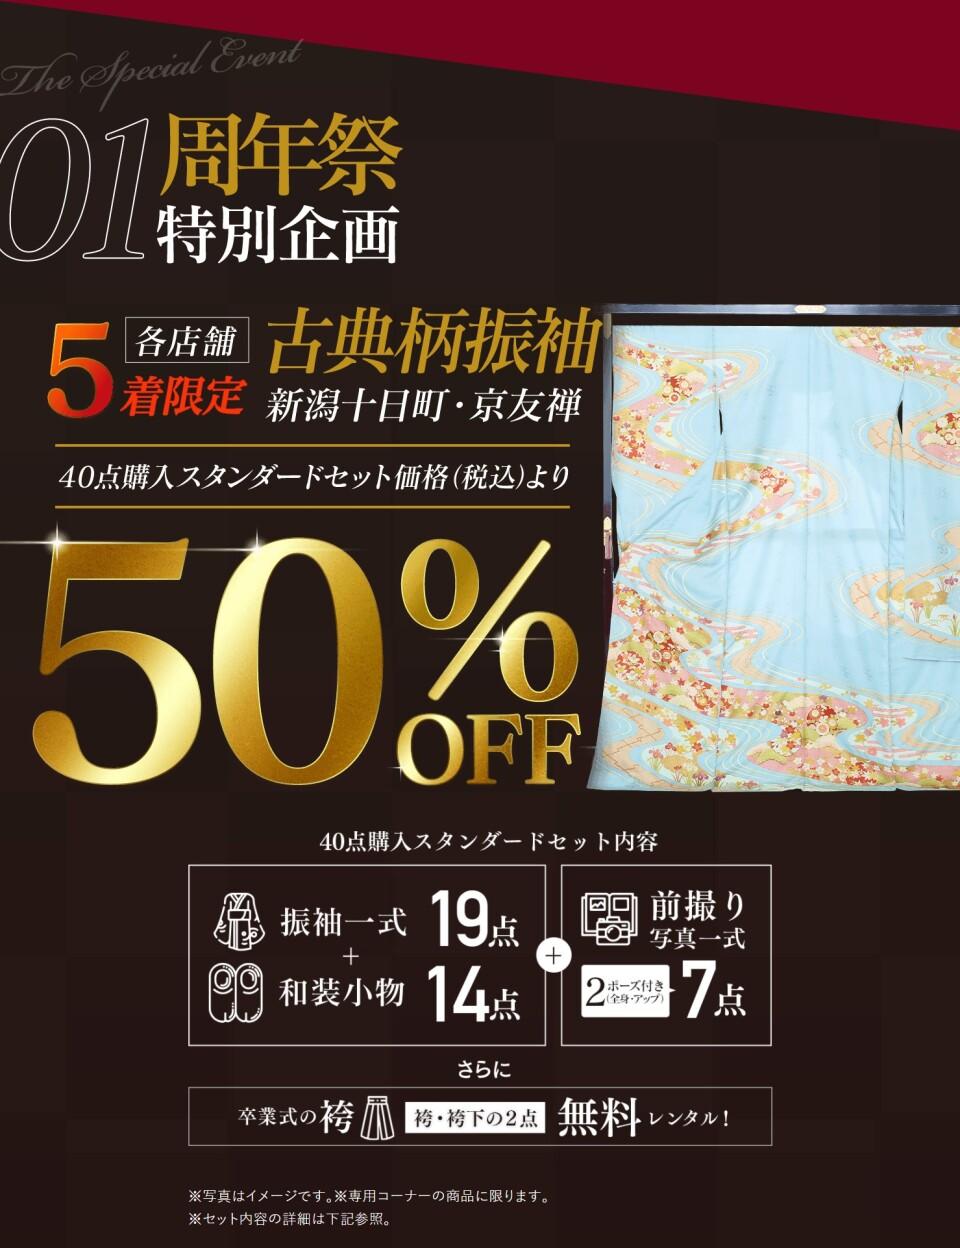 FireShot Capture 4753 - オンディーヌ各店周年祭|成人式の振袖レンタル・販売オンディーヌ - www.ondine.jp